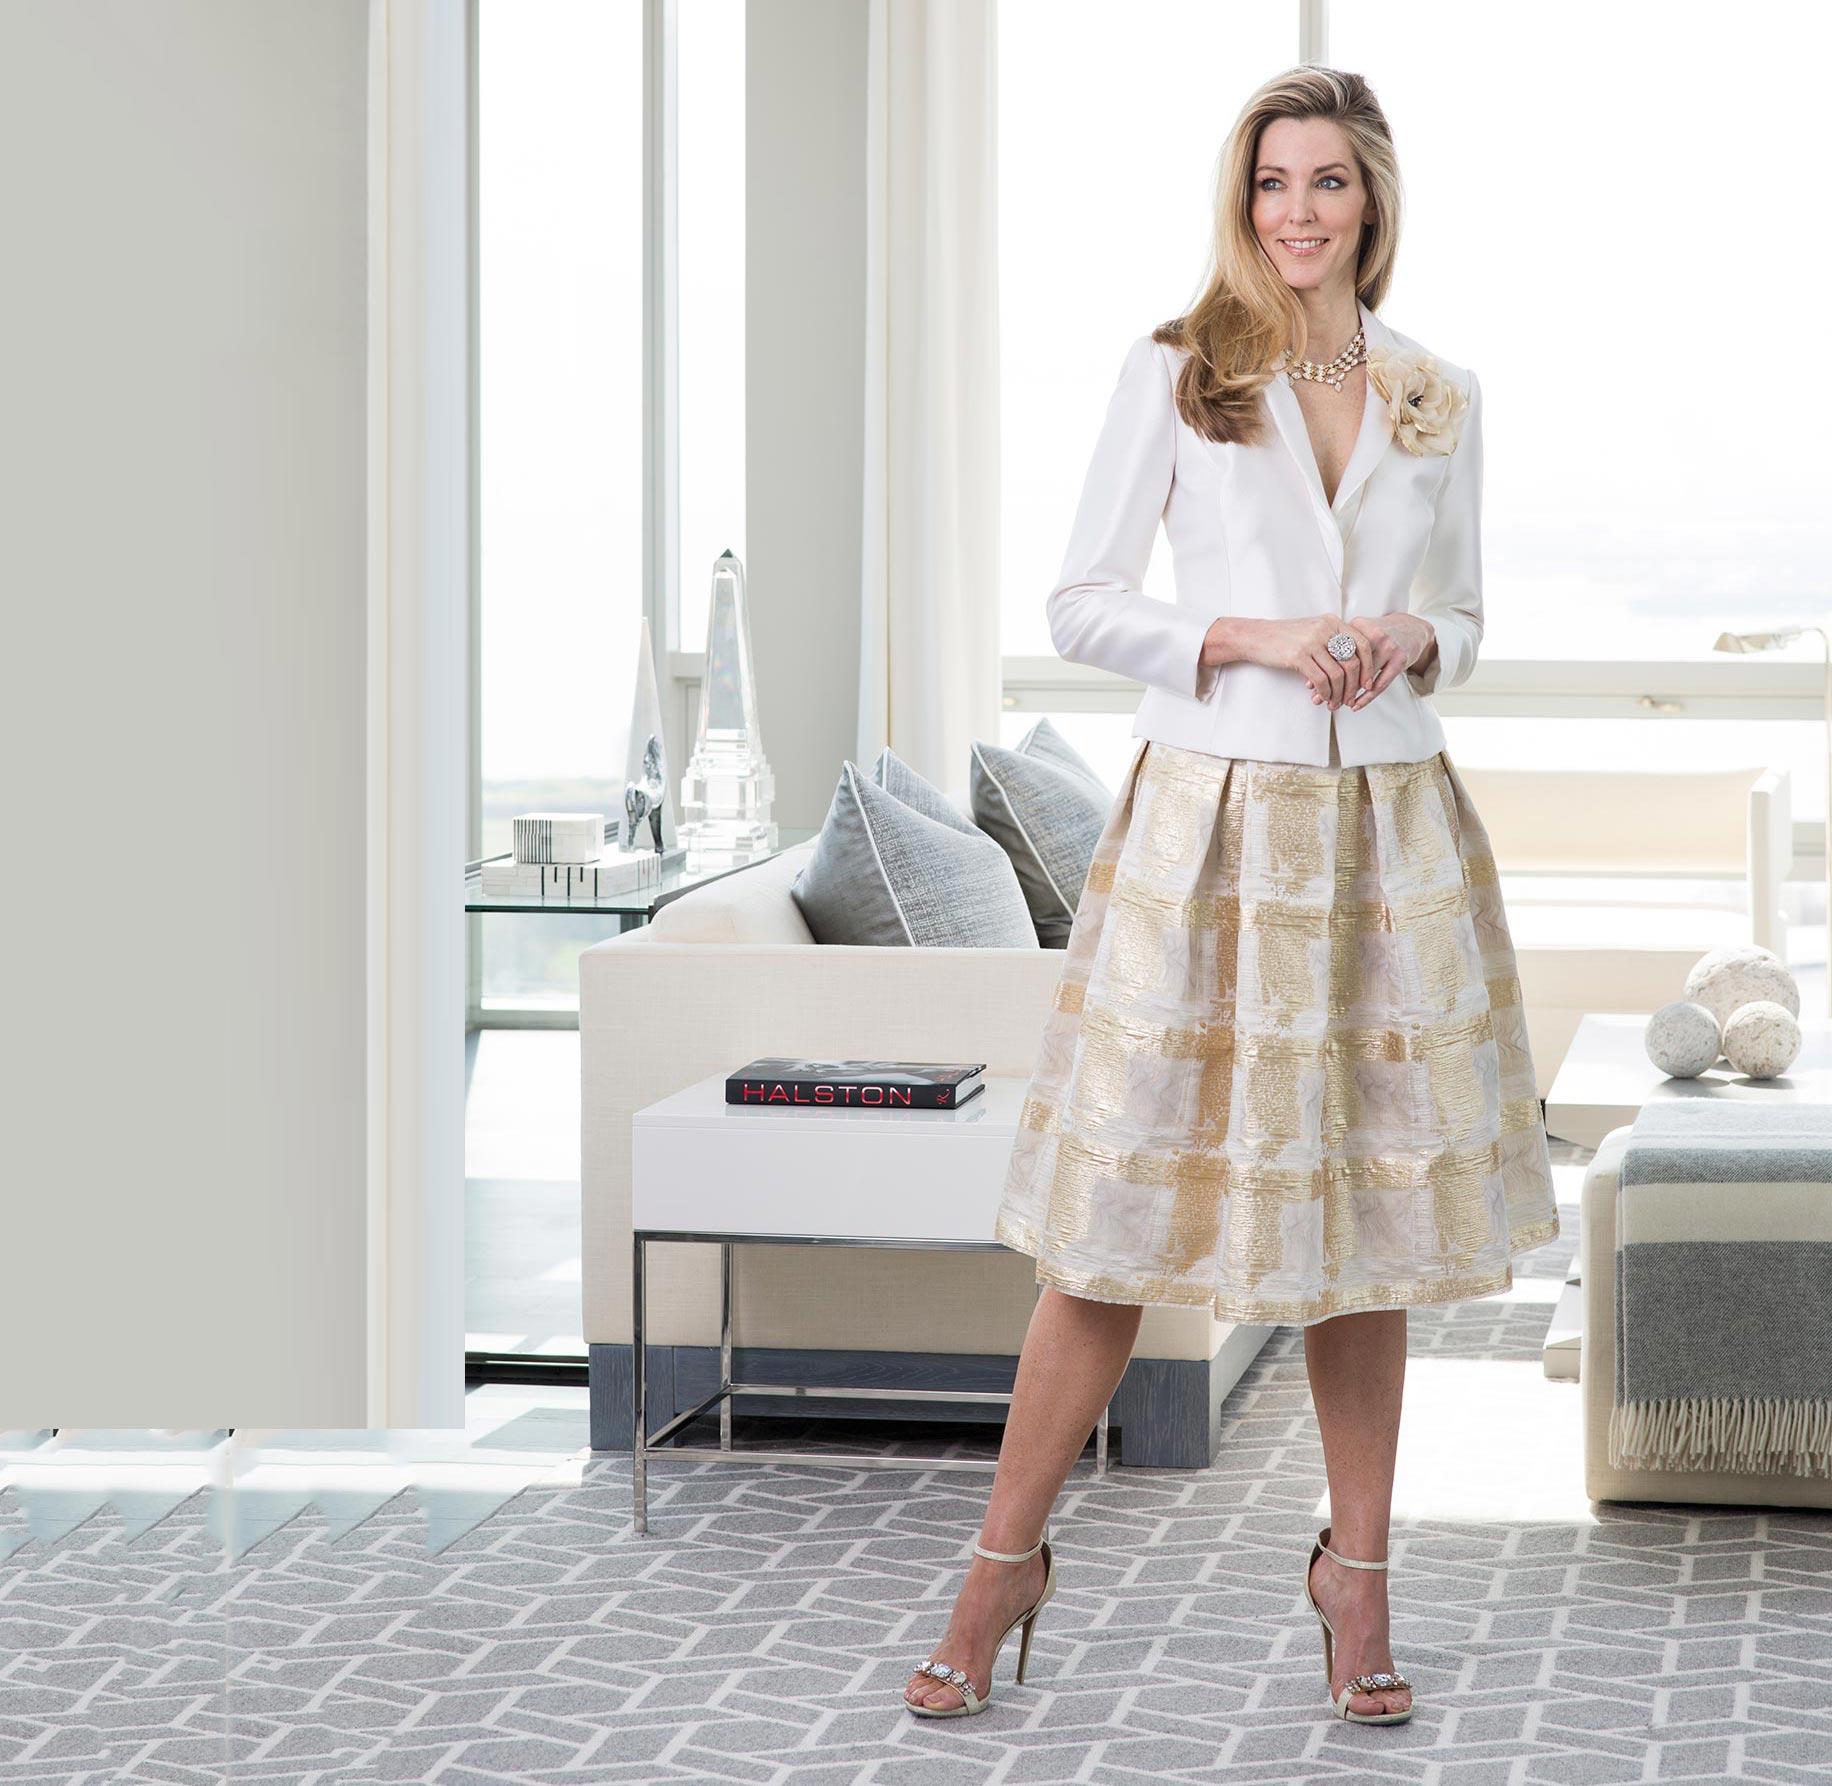 Custom elegant clothing for any occasion